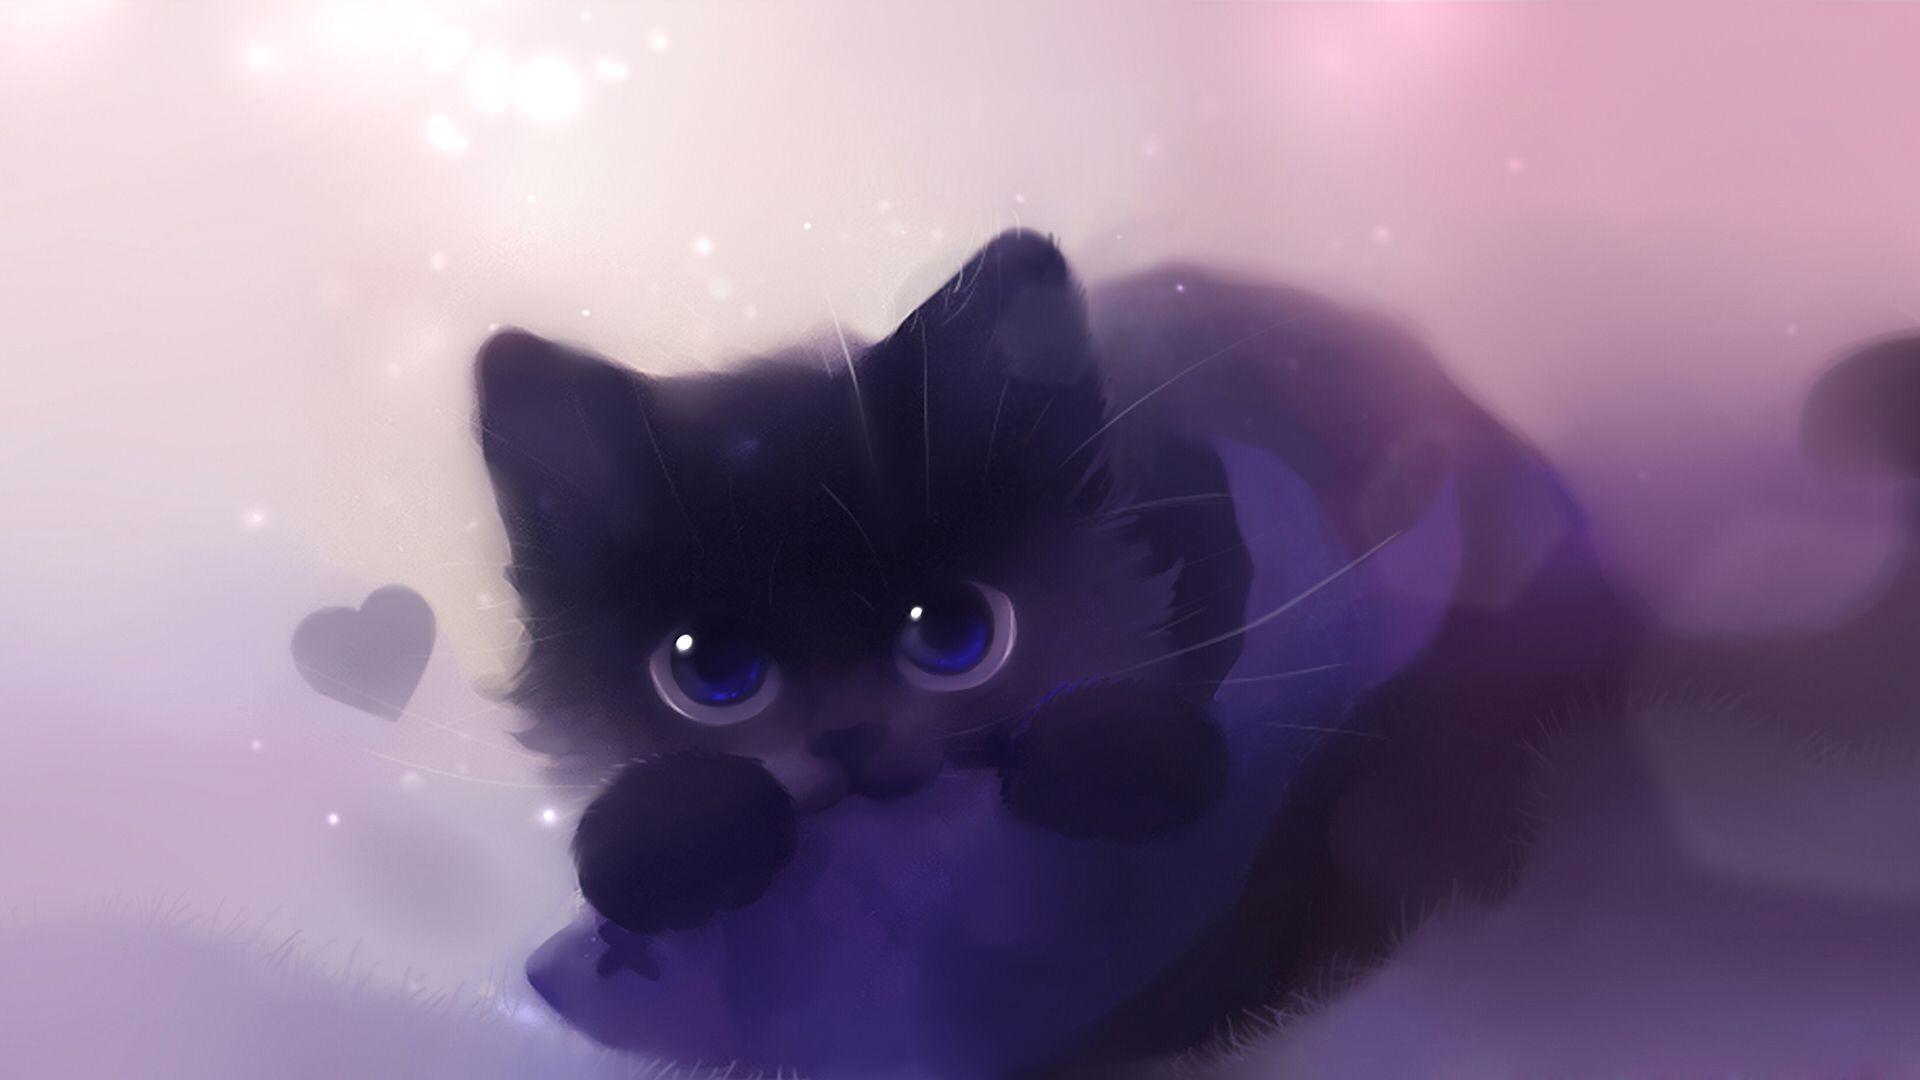 Kawaii Anime Cat Wallpapers Top Free Kawaii Anime Cat